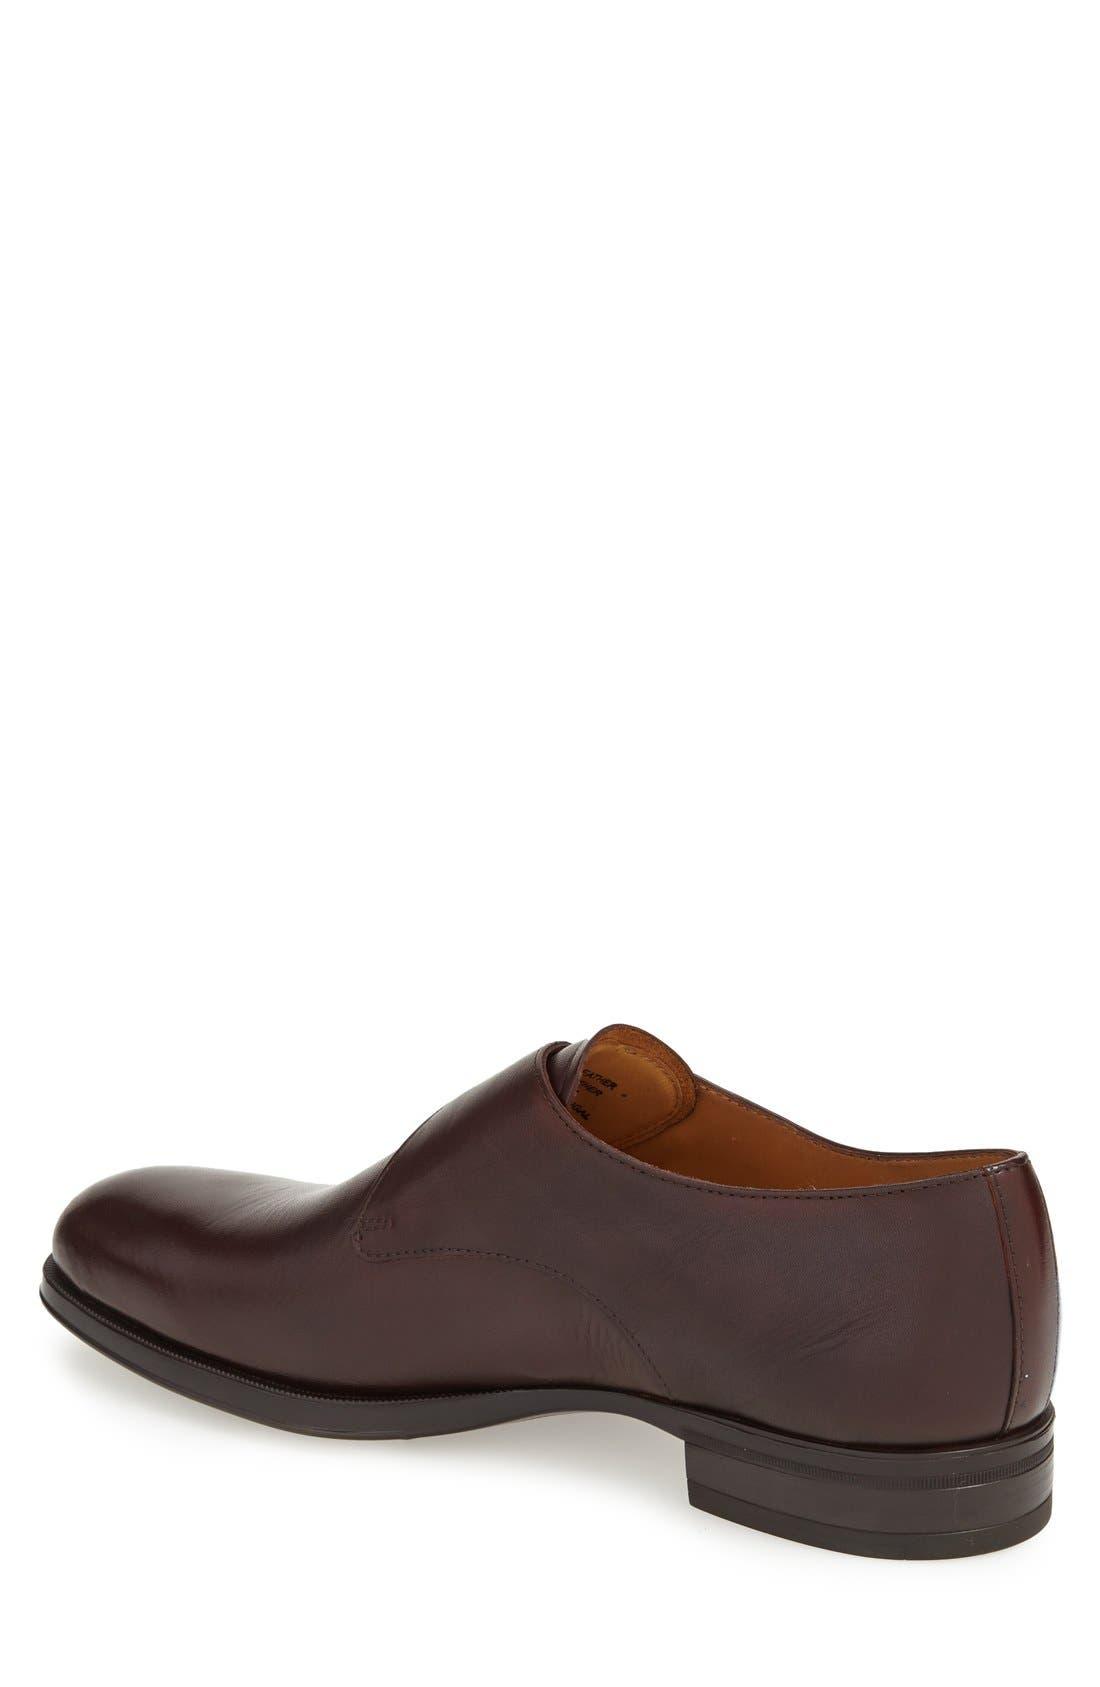 'Trifolo' Monk Strap Shoe,                             Alternate thumbnail 2, color,                             Dark Woodbury Leather